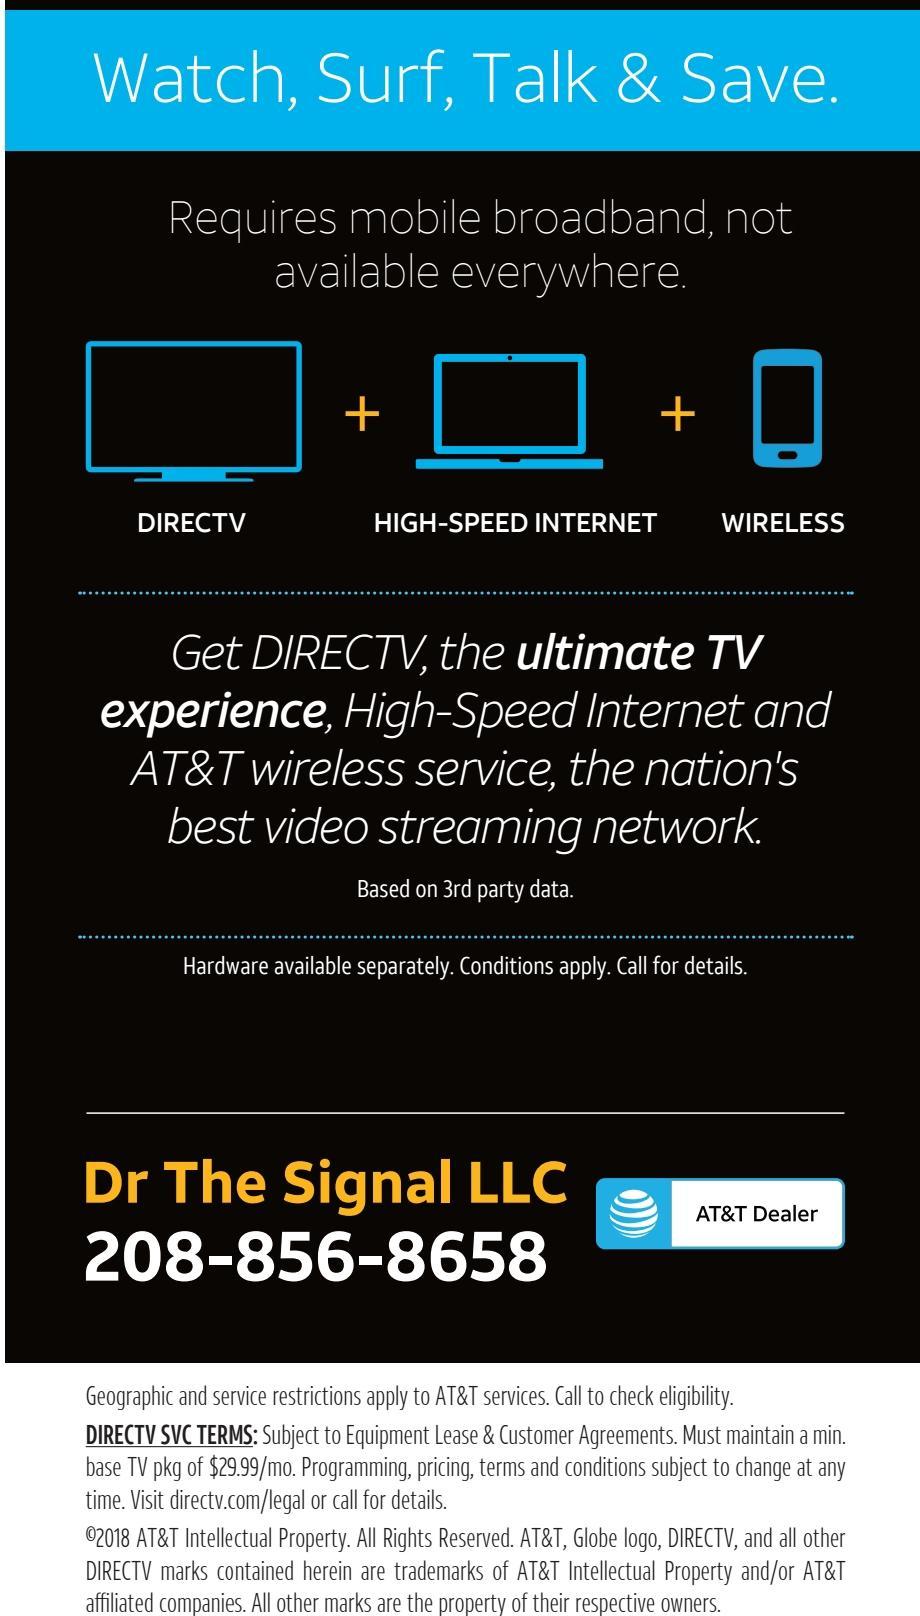 Dr The Signal LLC image 8